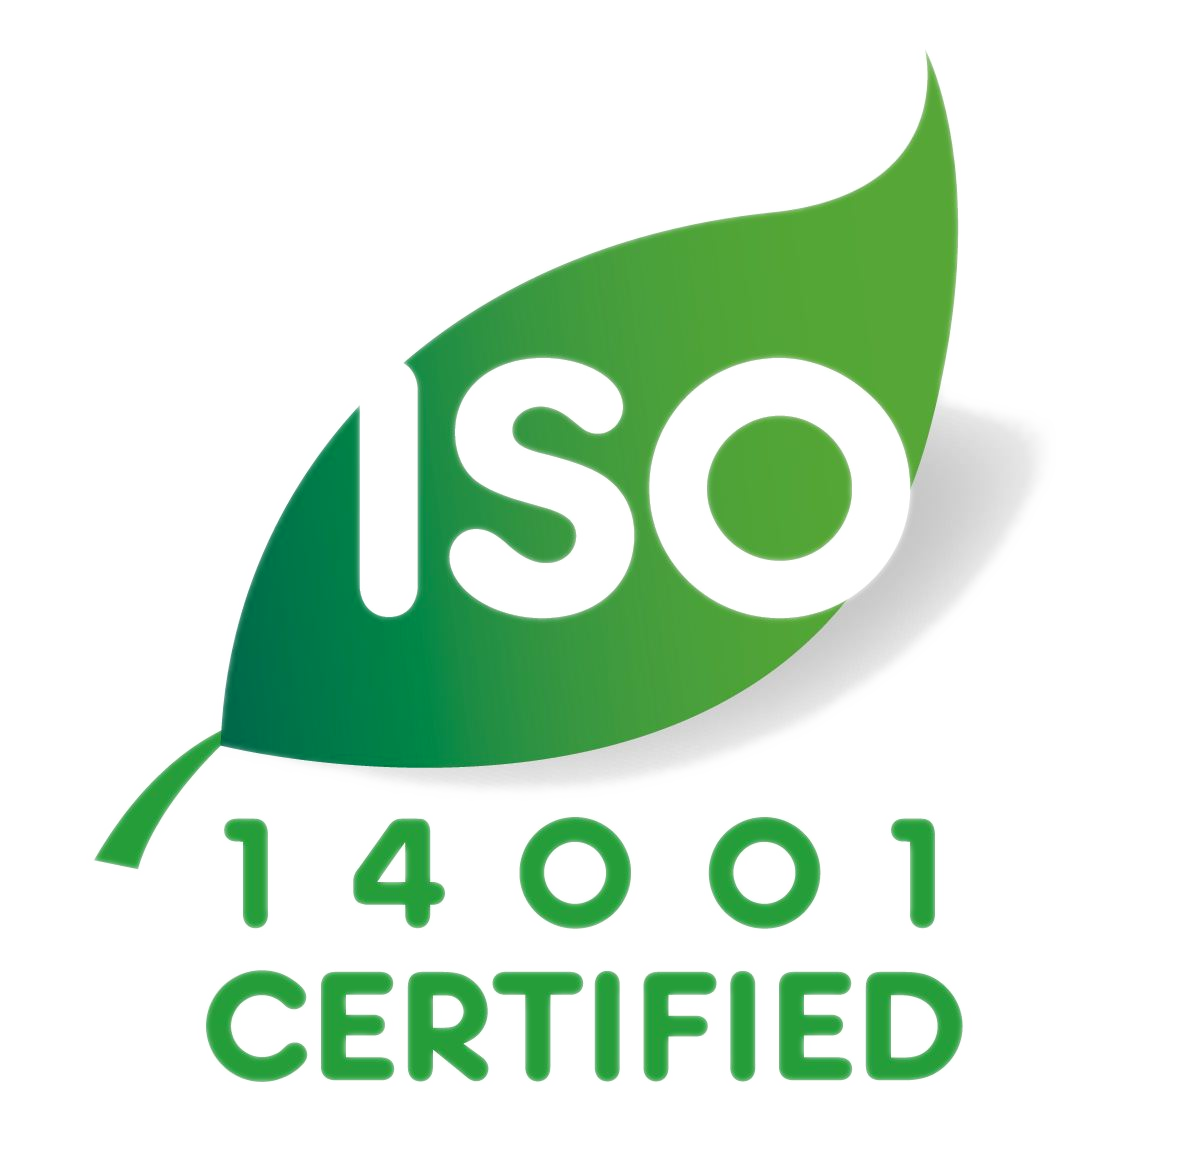 kisspng-logo-iso-14-1-iso-14-certification-internation-quick-ship-brands-5b900d79d94723.87517554153616728989